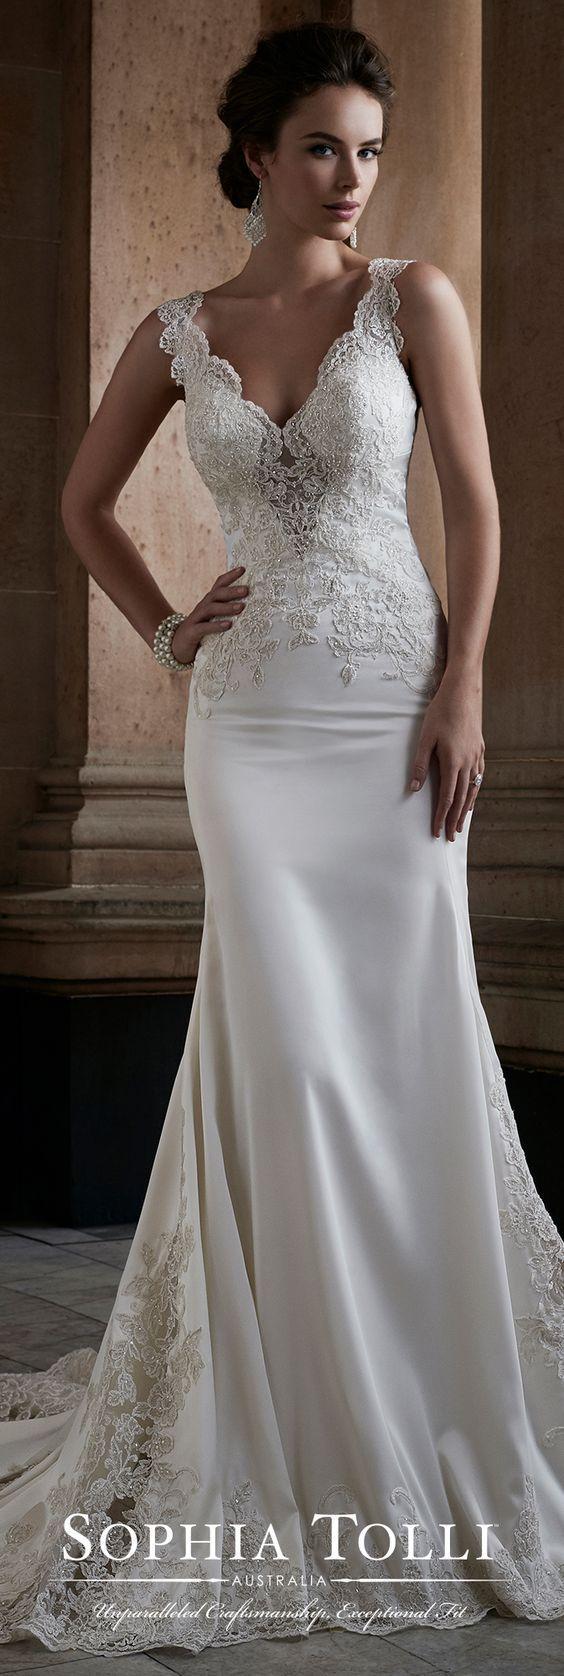 Country wedding mother dresses   best Wedding Dress images on Pinterest  Wedding frocks Bridal